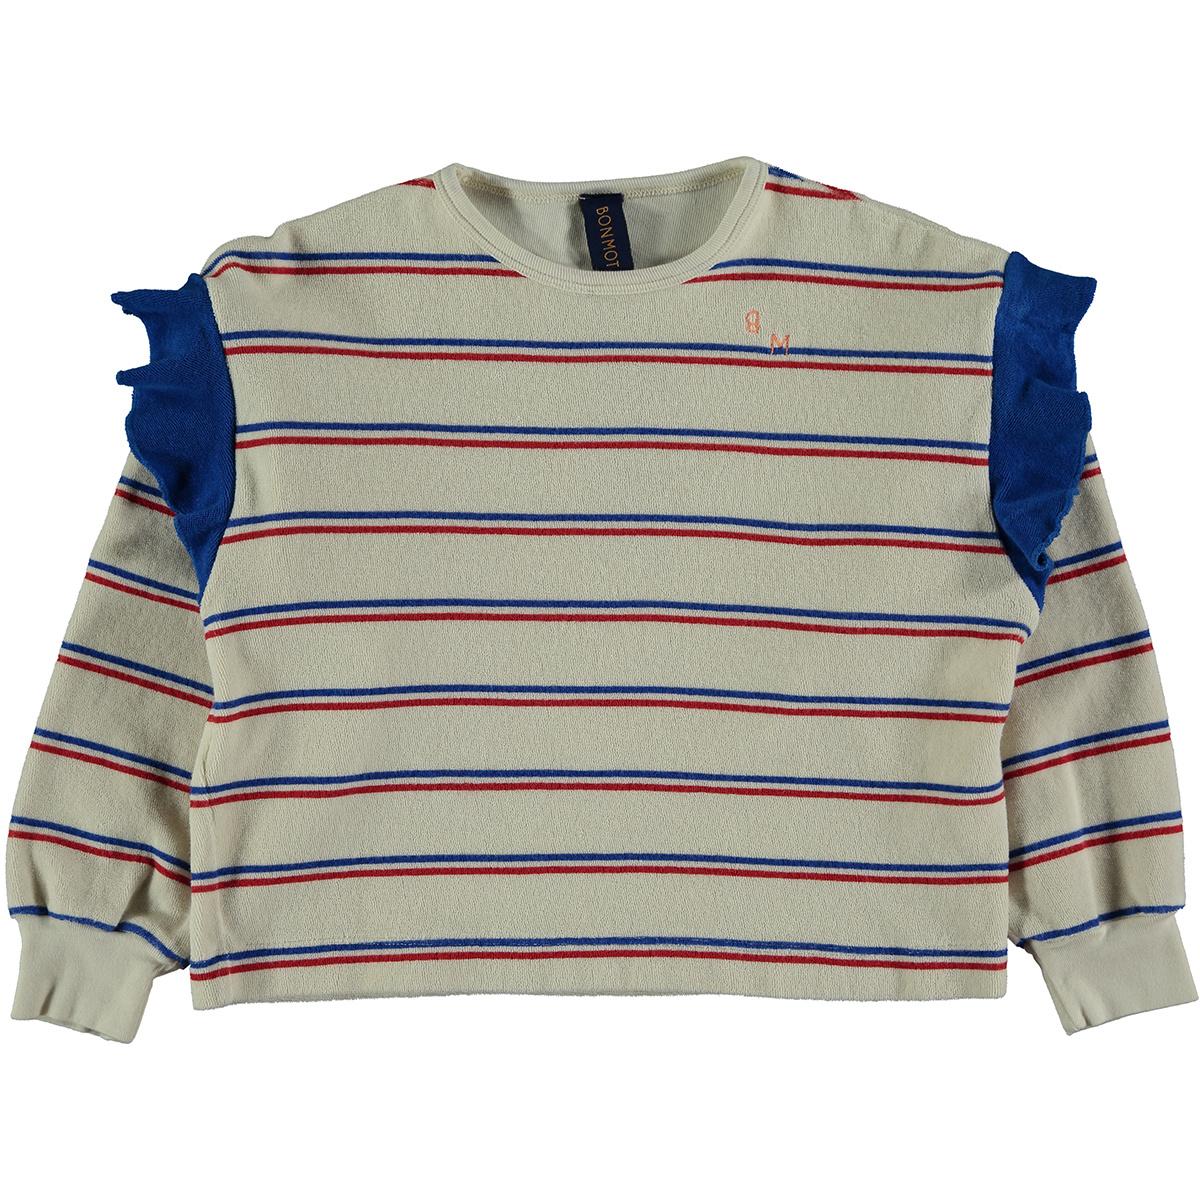 Sweatshirt baby Frill - Ivory-1